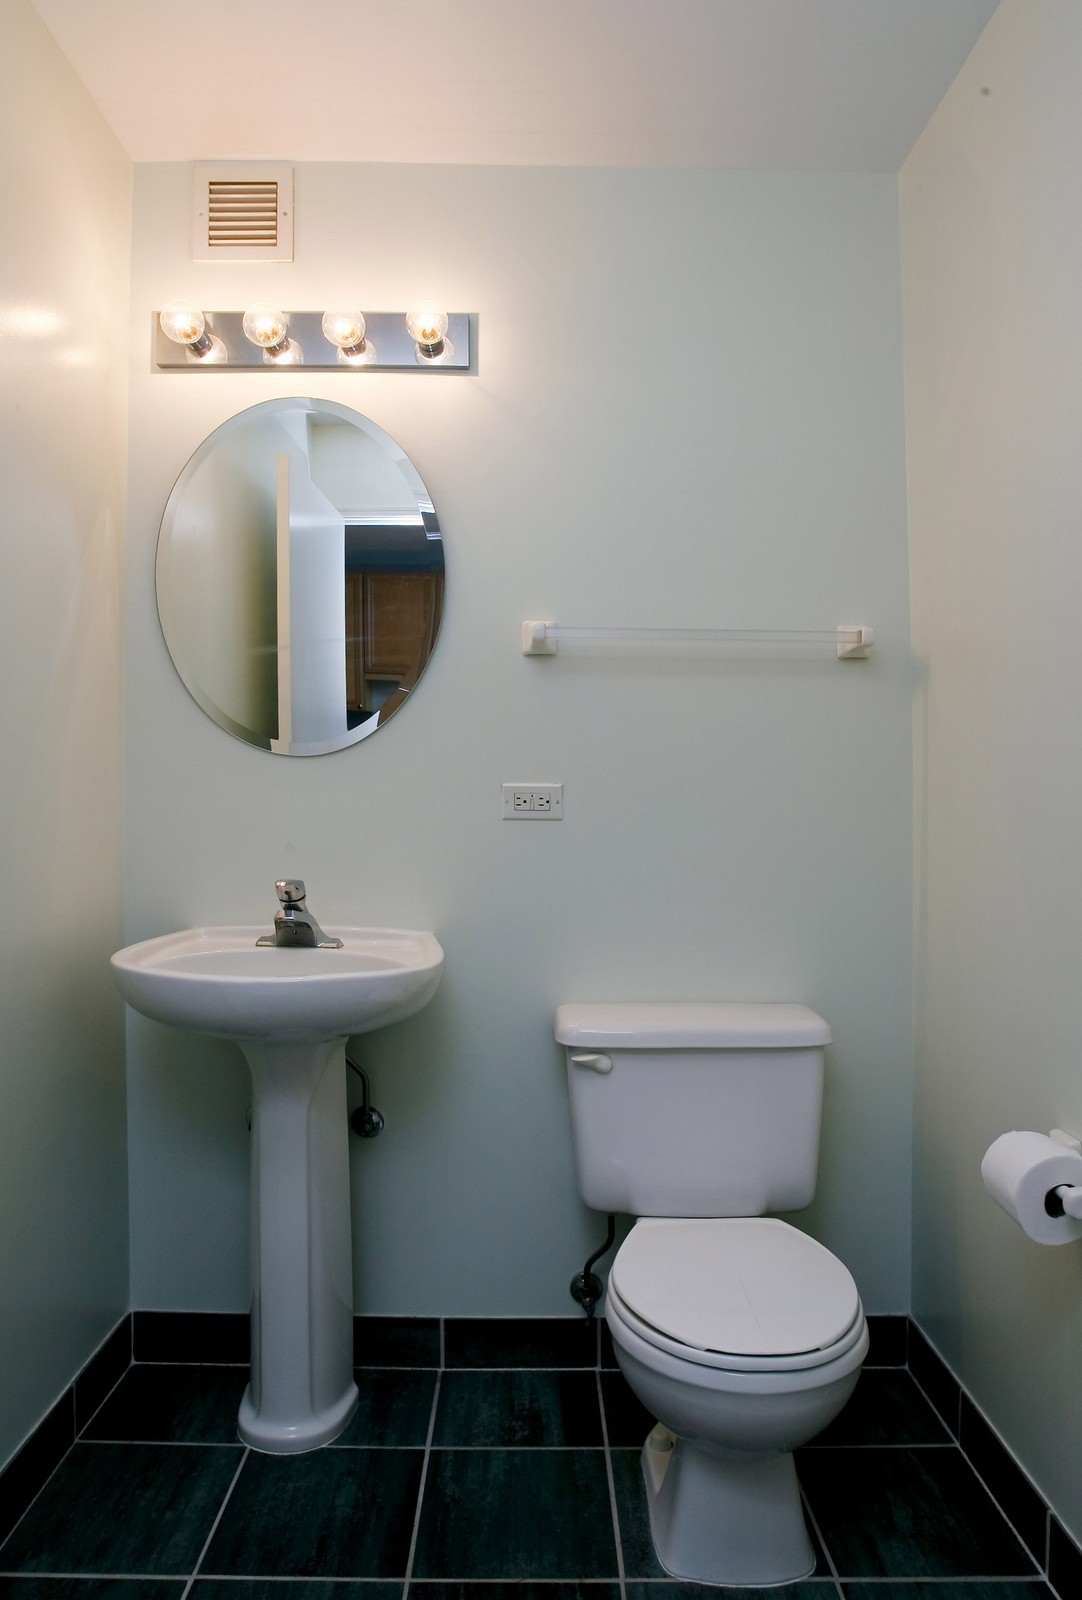 Real Estate Photography - 21 W Chestnut, Unit 806, Chicago, IL, 60611 - Half Bath